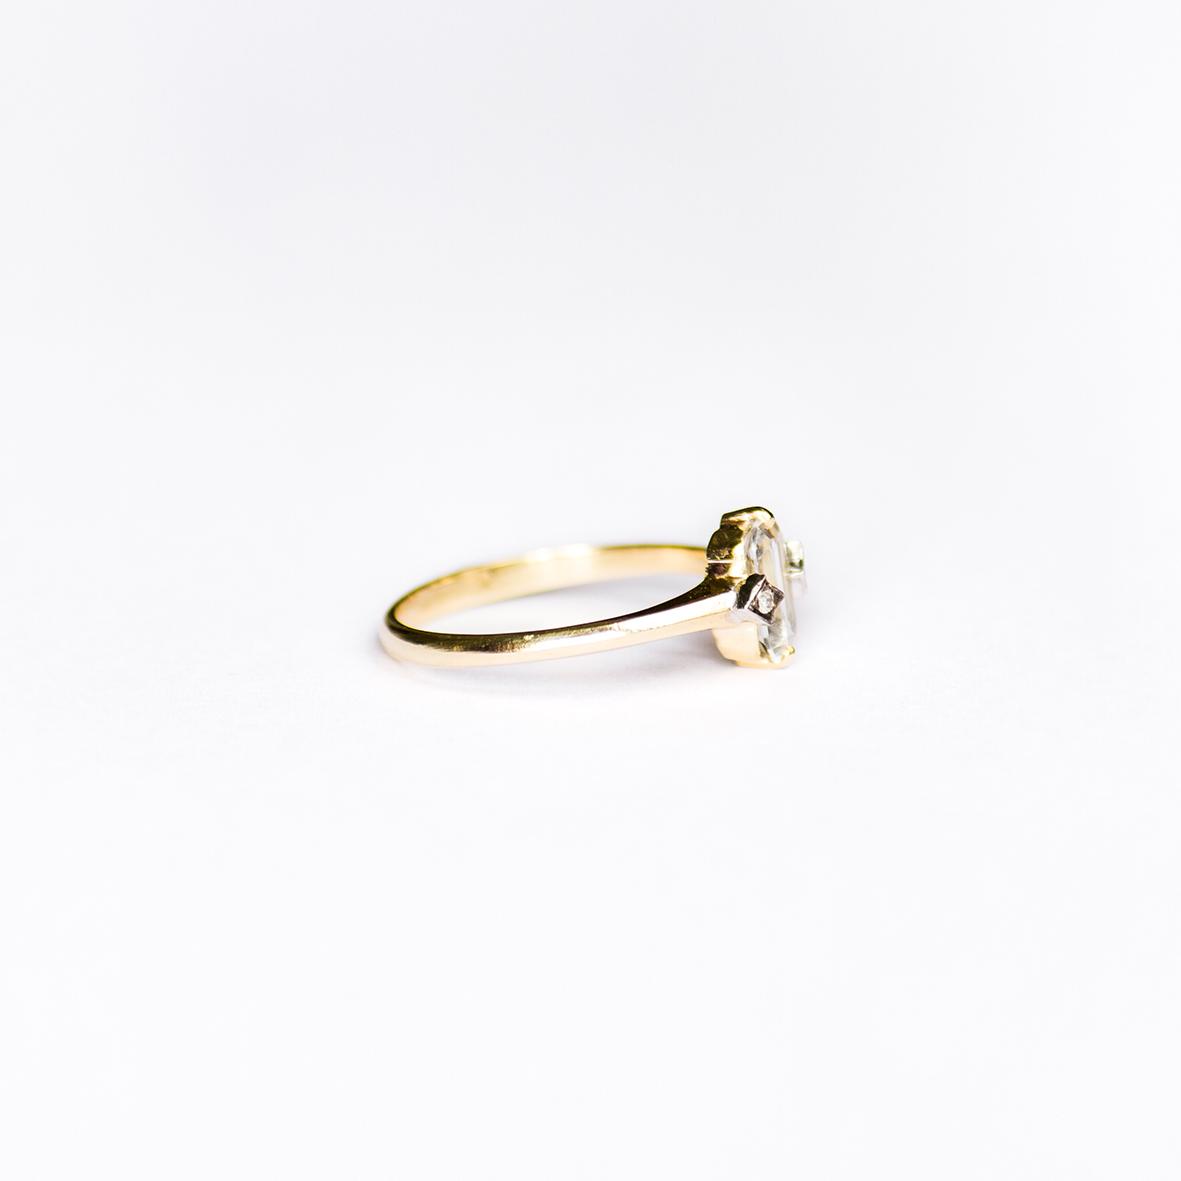 2. OONA_engagement_ficha2_single sapphire ring 2 copia